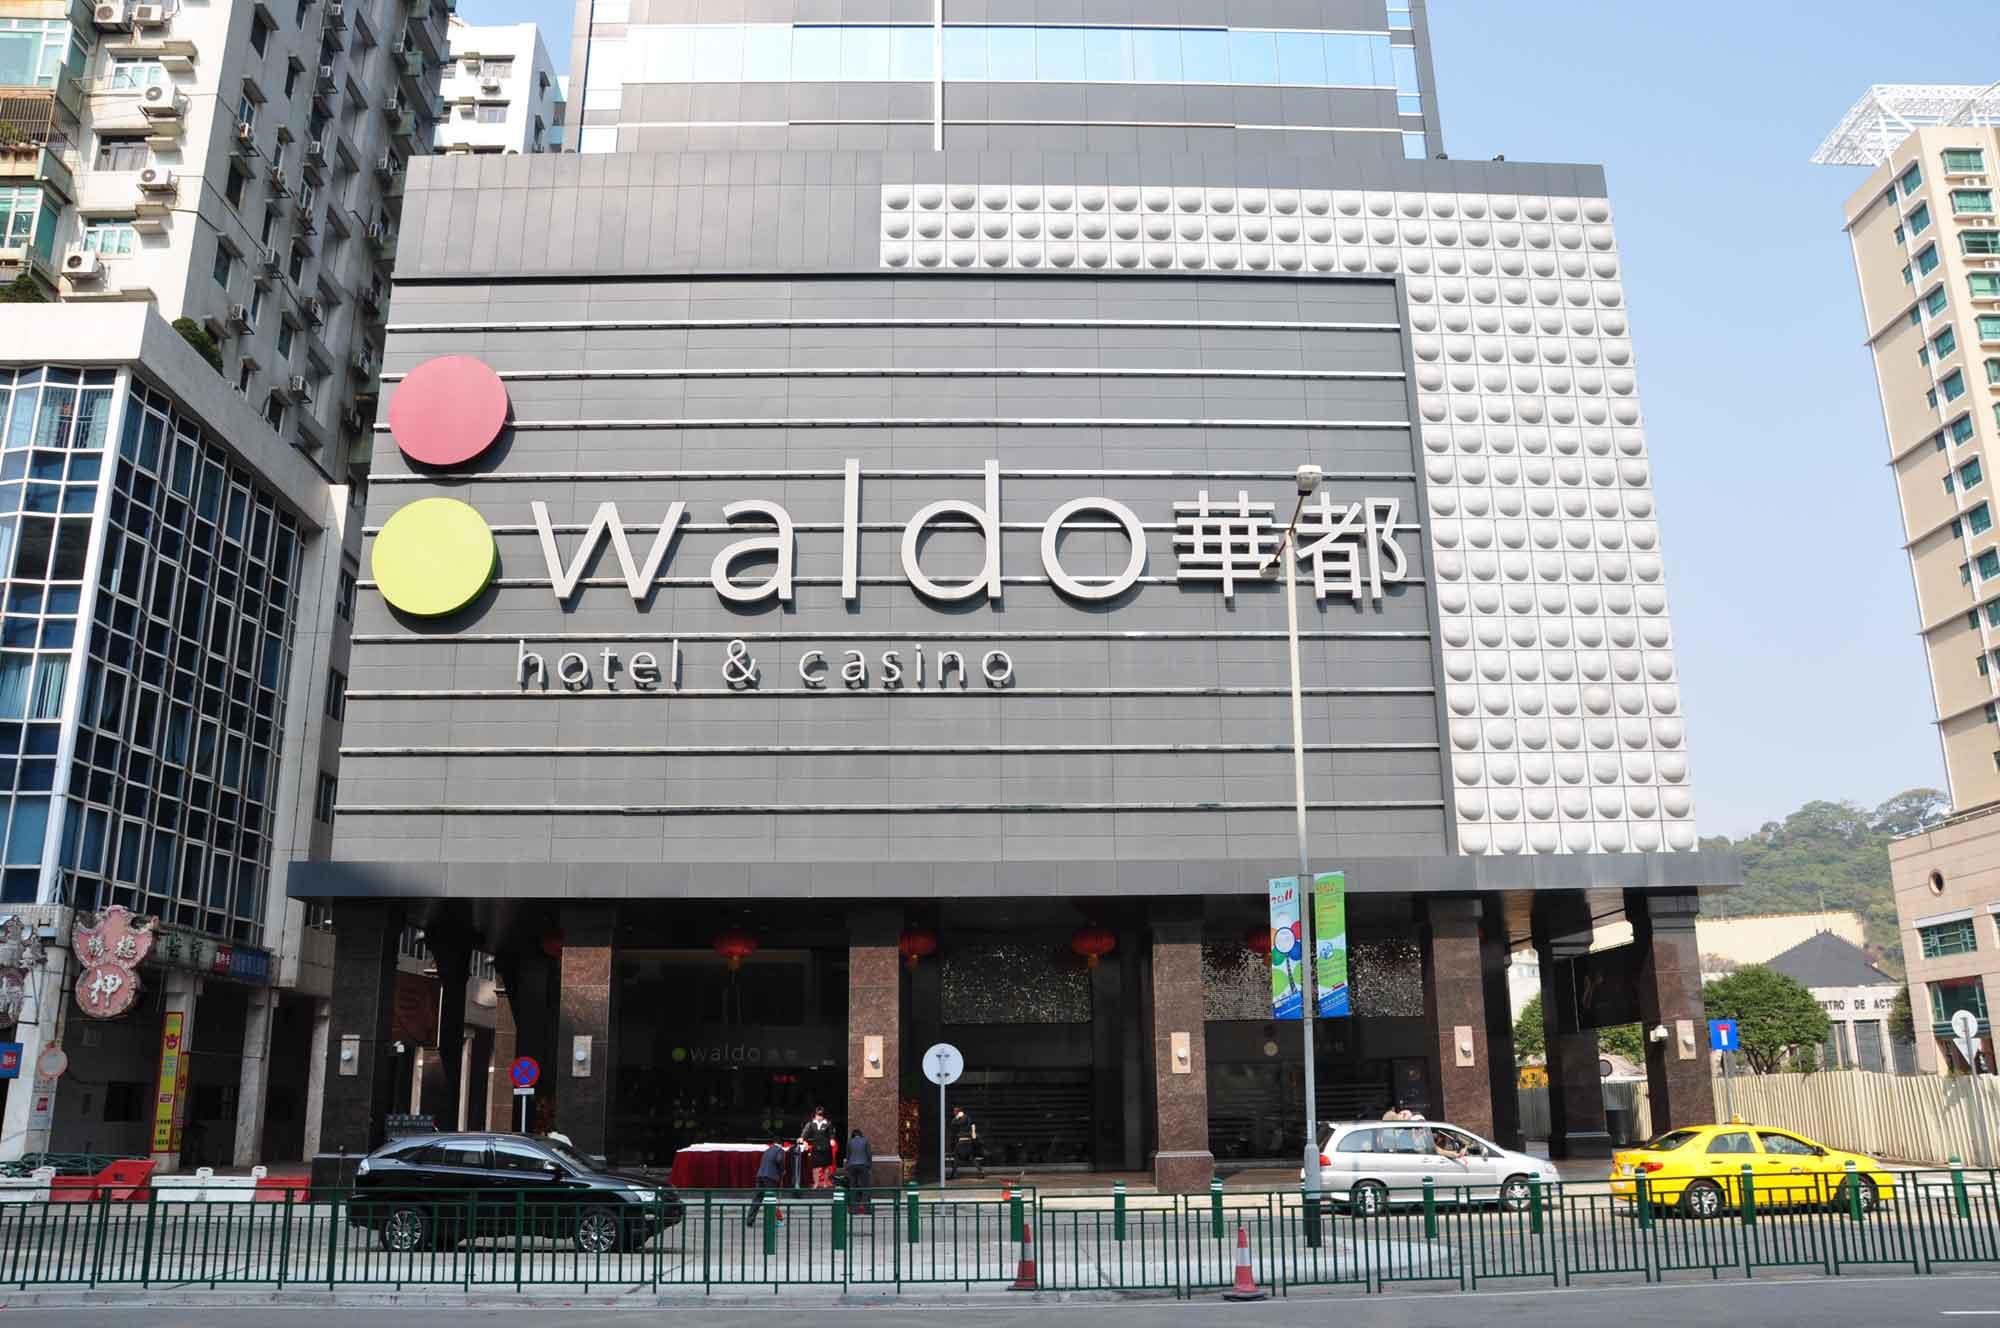 Waldo hotel and casino